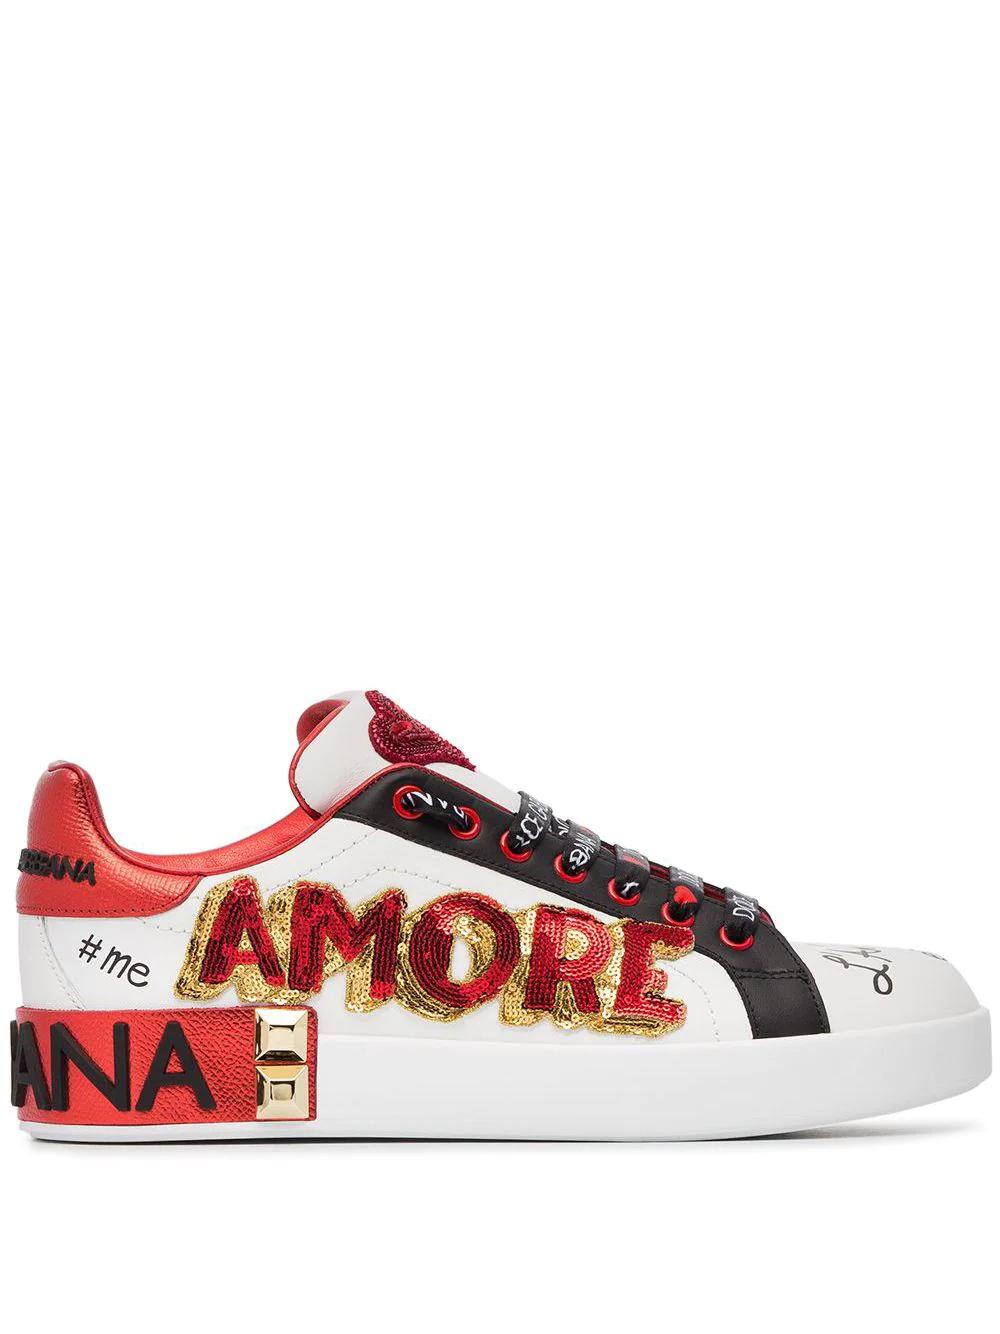 Dolce & Gabbana | кроссовки 'Amore Heart' с вышивкой | Clouty